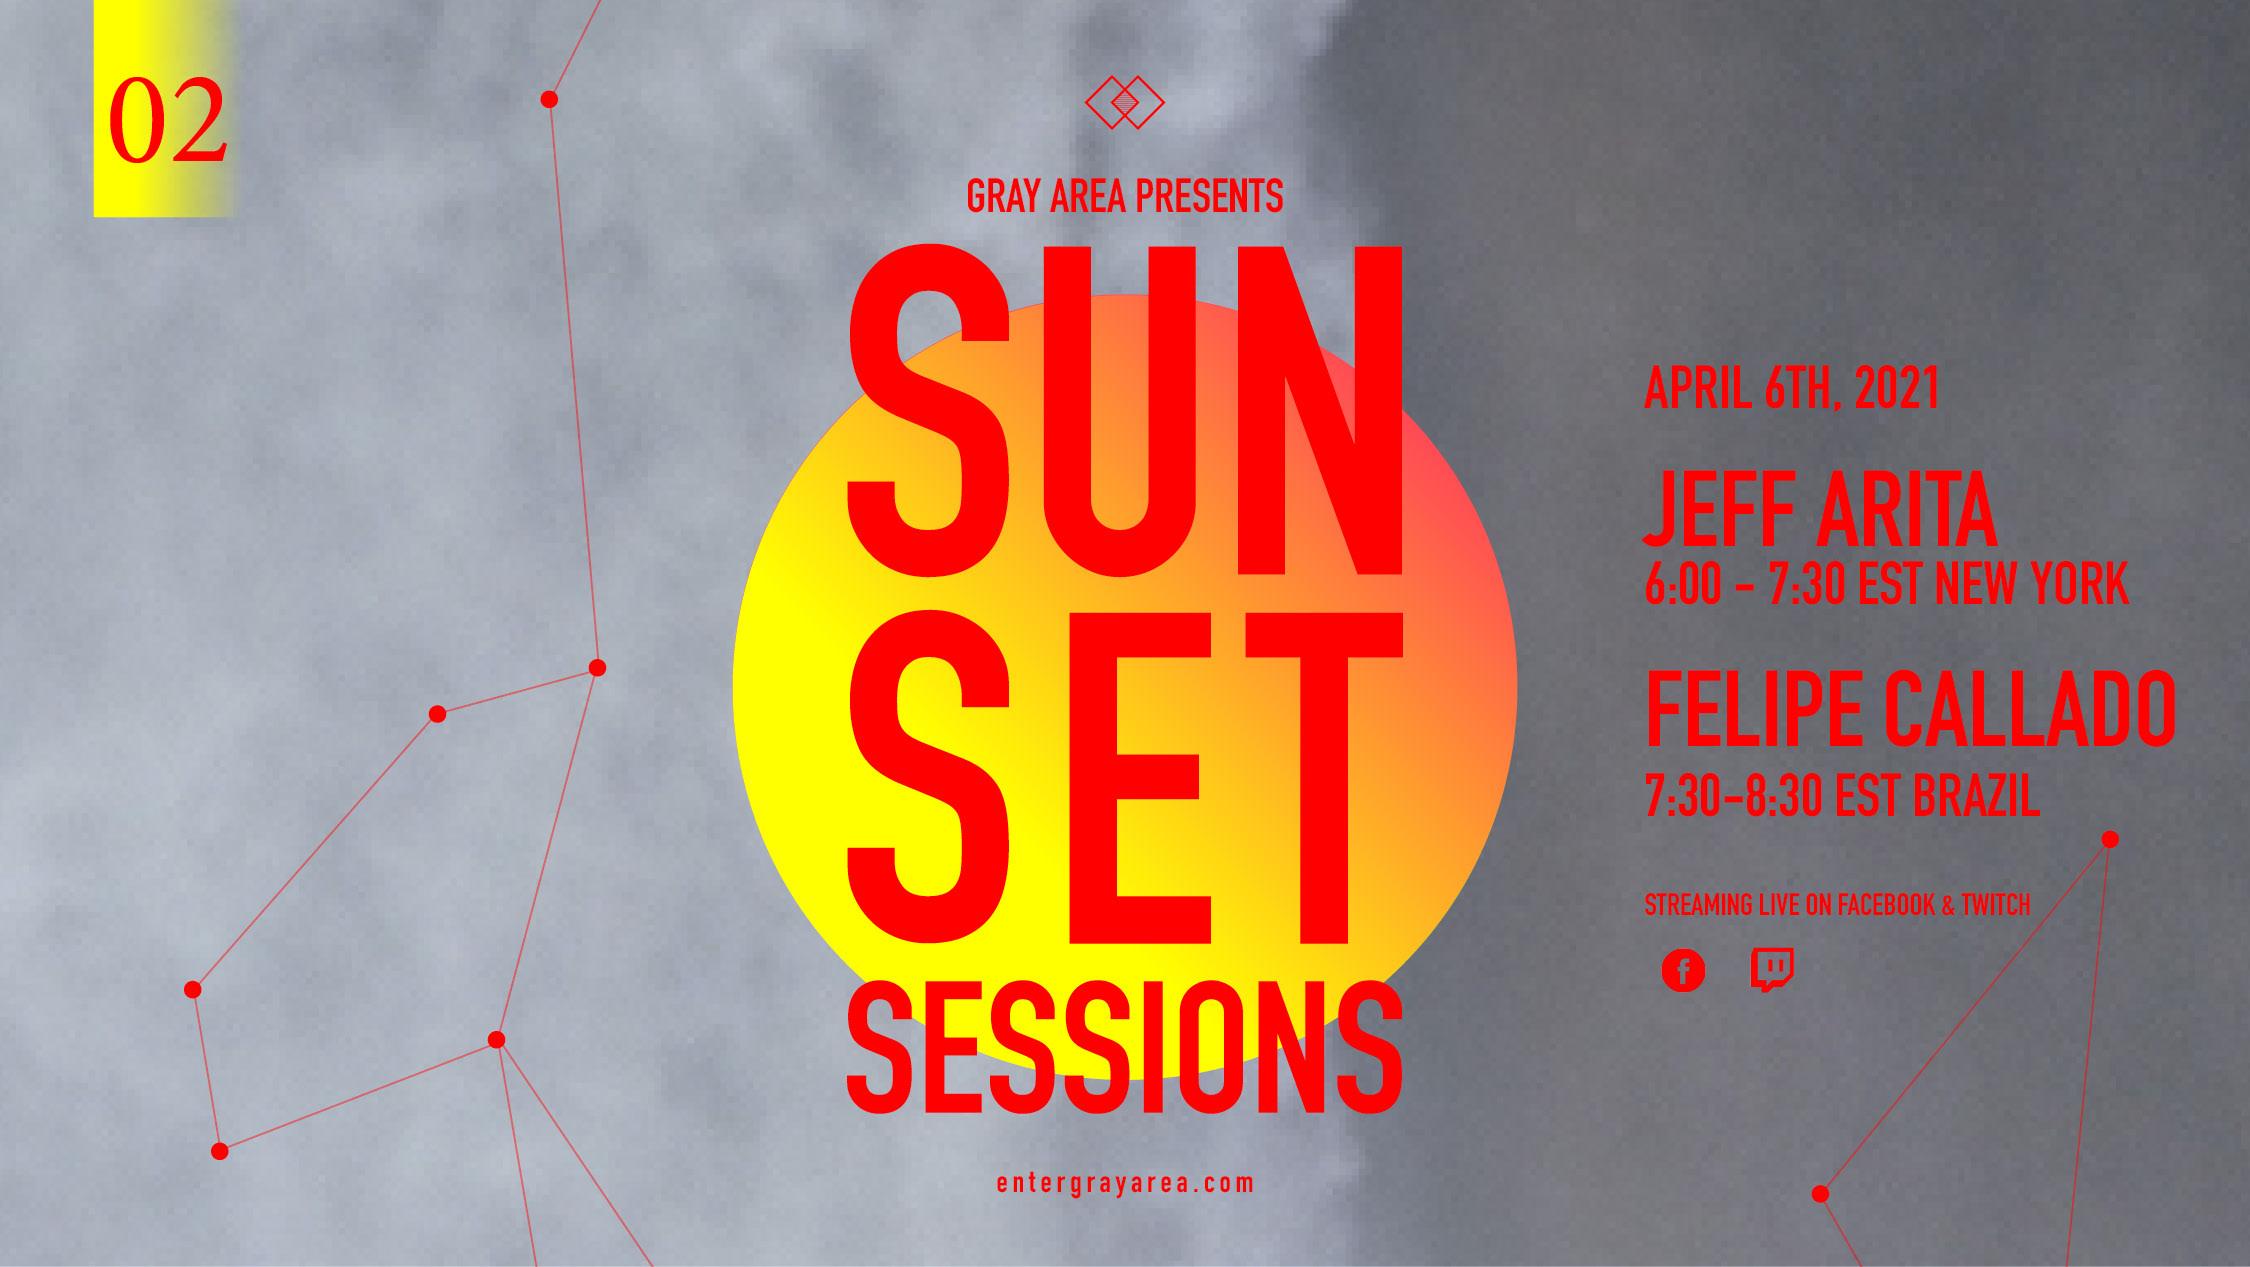 Sunset Sessions 02 w/ Jeff Arita [NYC] / Felipe Callado [Brasil]